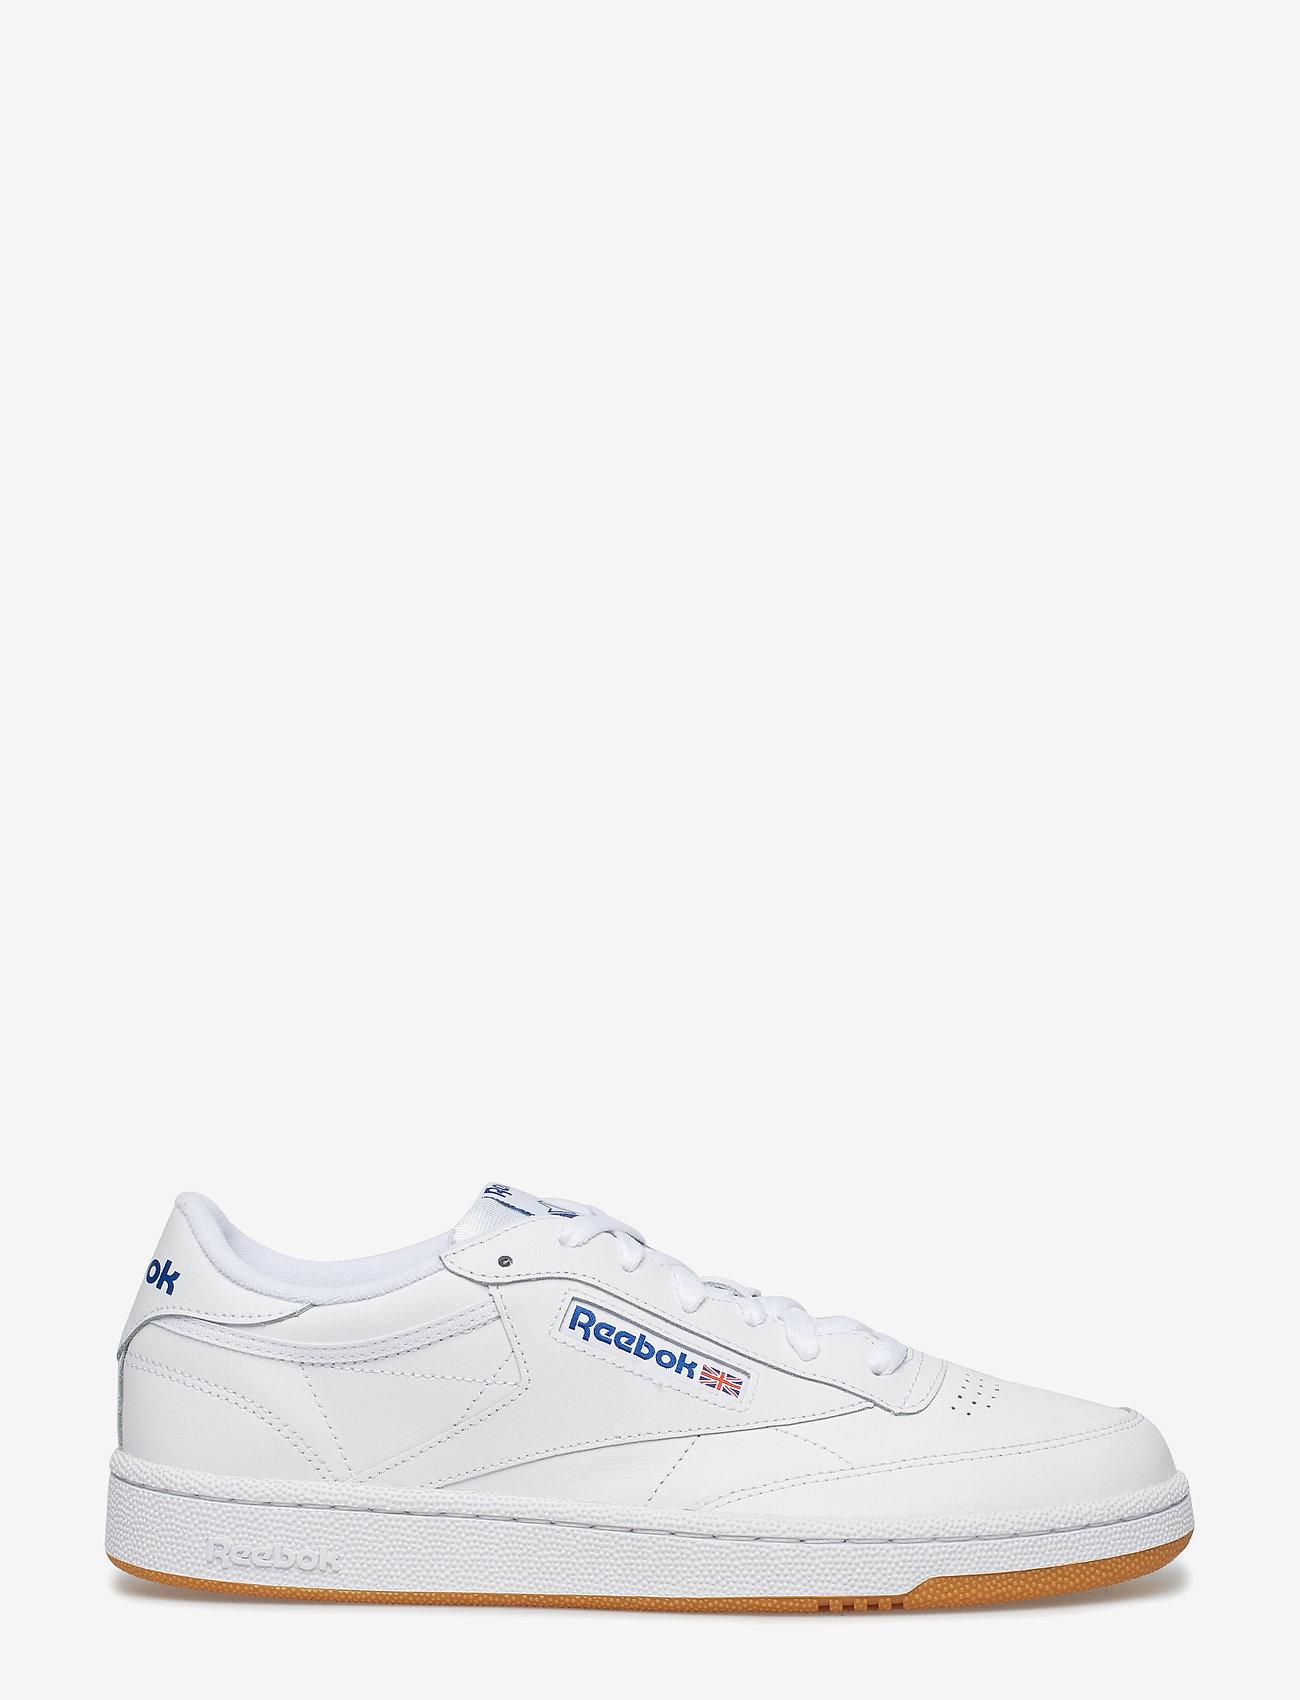 Reebok Classics - CLUB C 85 - laag sneakers - white/royal/gum - 1